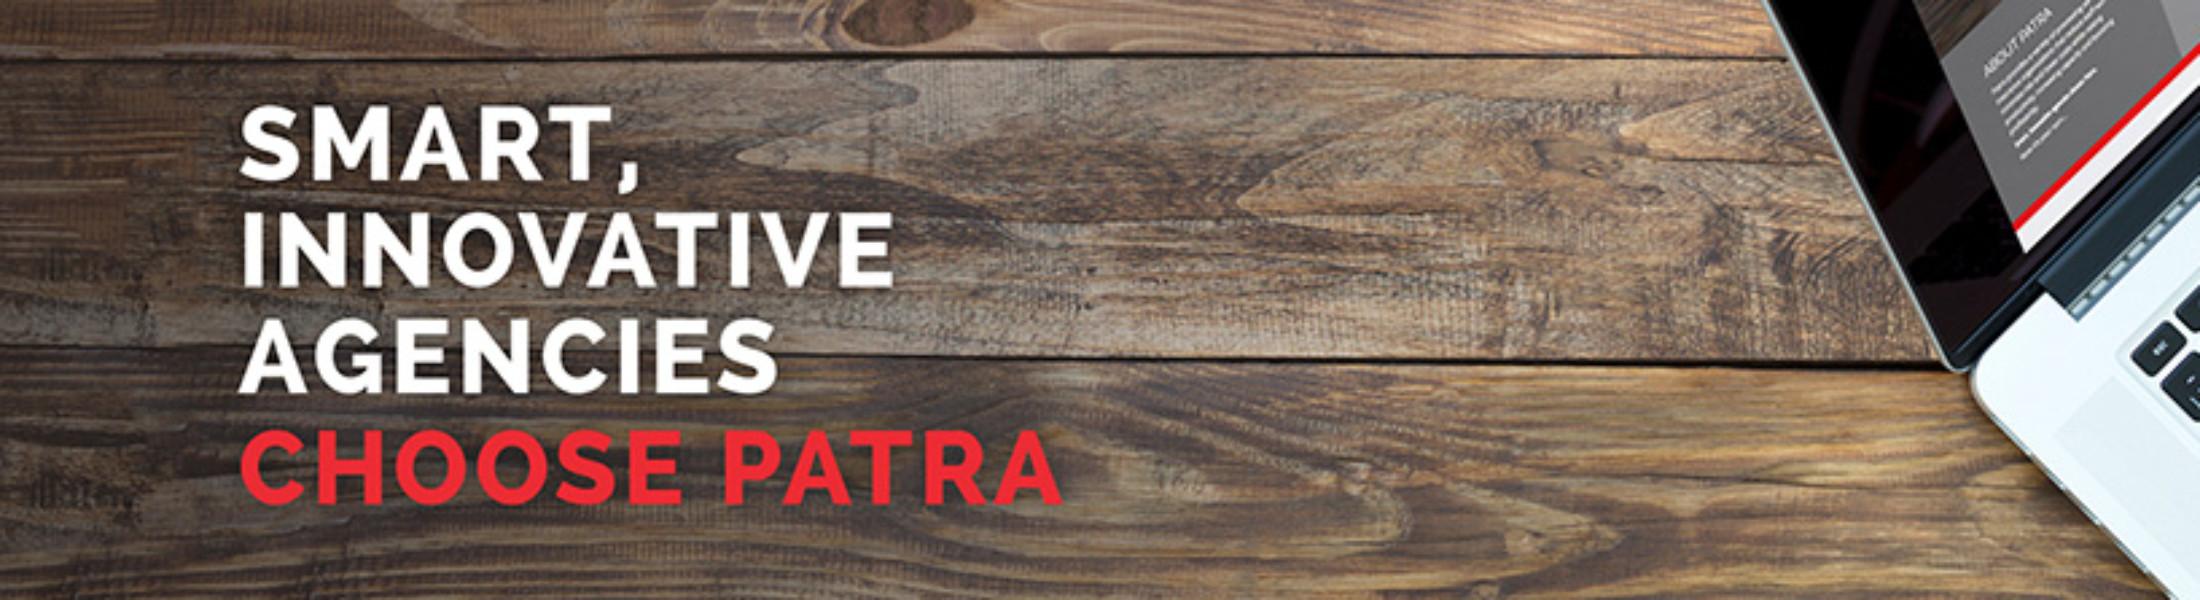 hardwood flooring kansas city mo of patra corp regarding slider img 1 2200x600 c